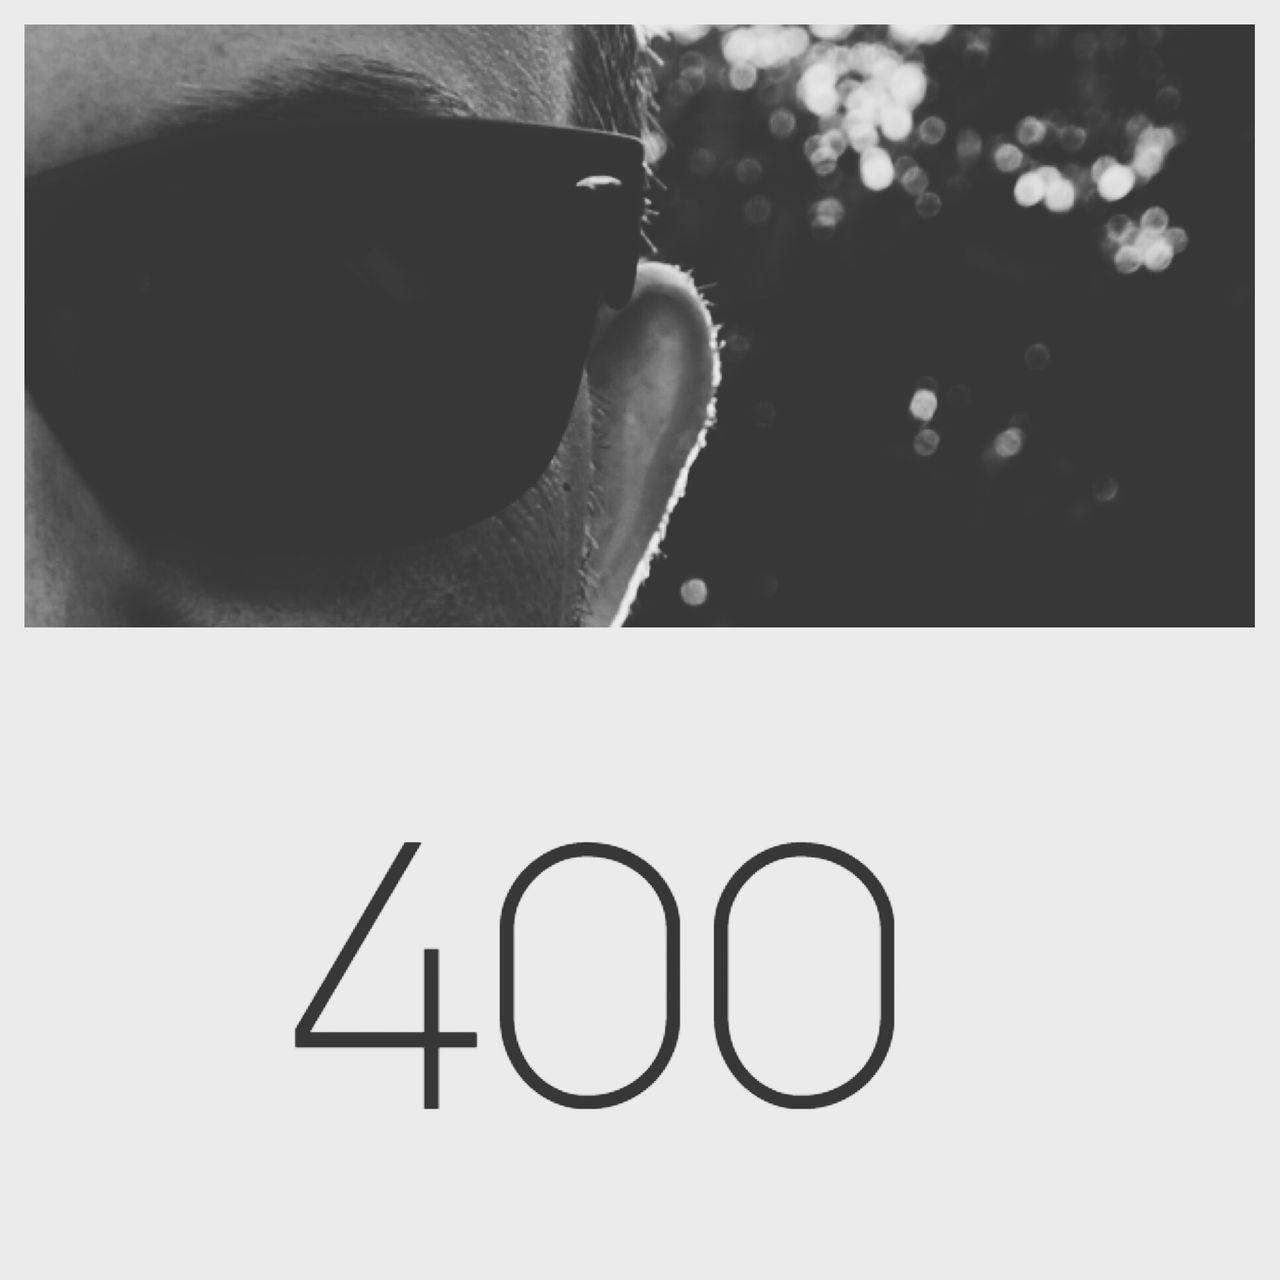 People Follower Followers 400 Thank You Thankyou Danke  Follow Me :) Followme Follow Sunglasses Black And White